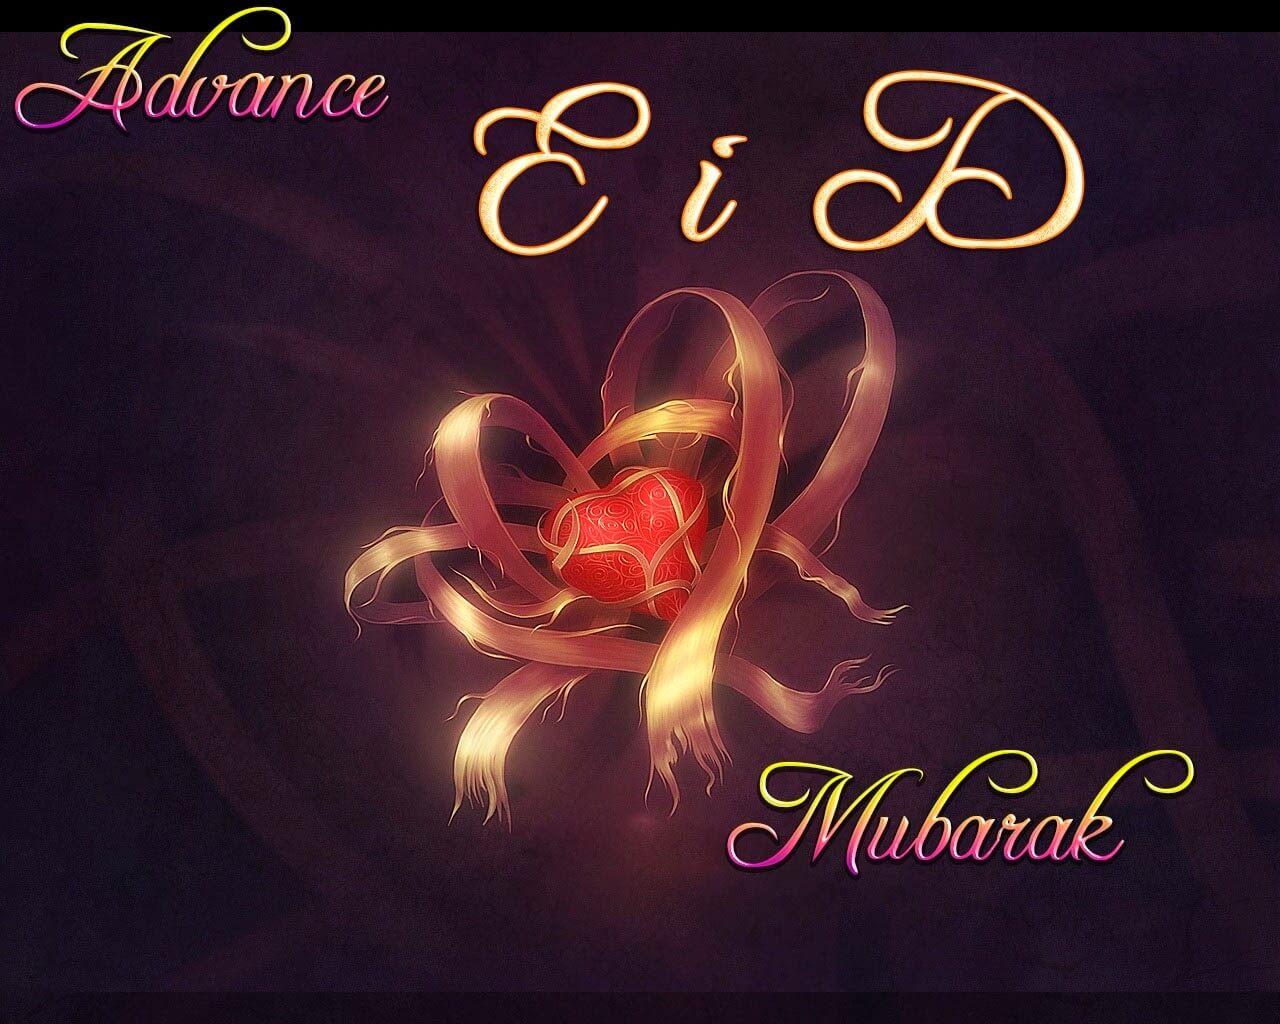 Eid Mubarak Special Greetings 2017 Eid Mubarak Card Free Downloads